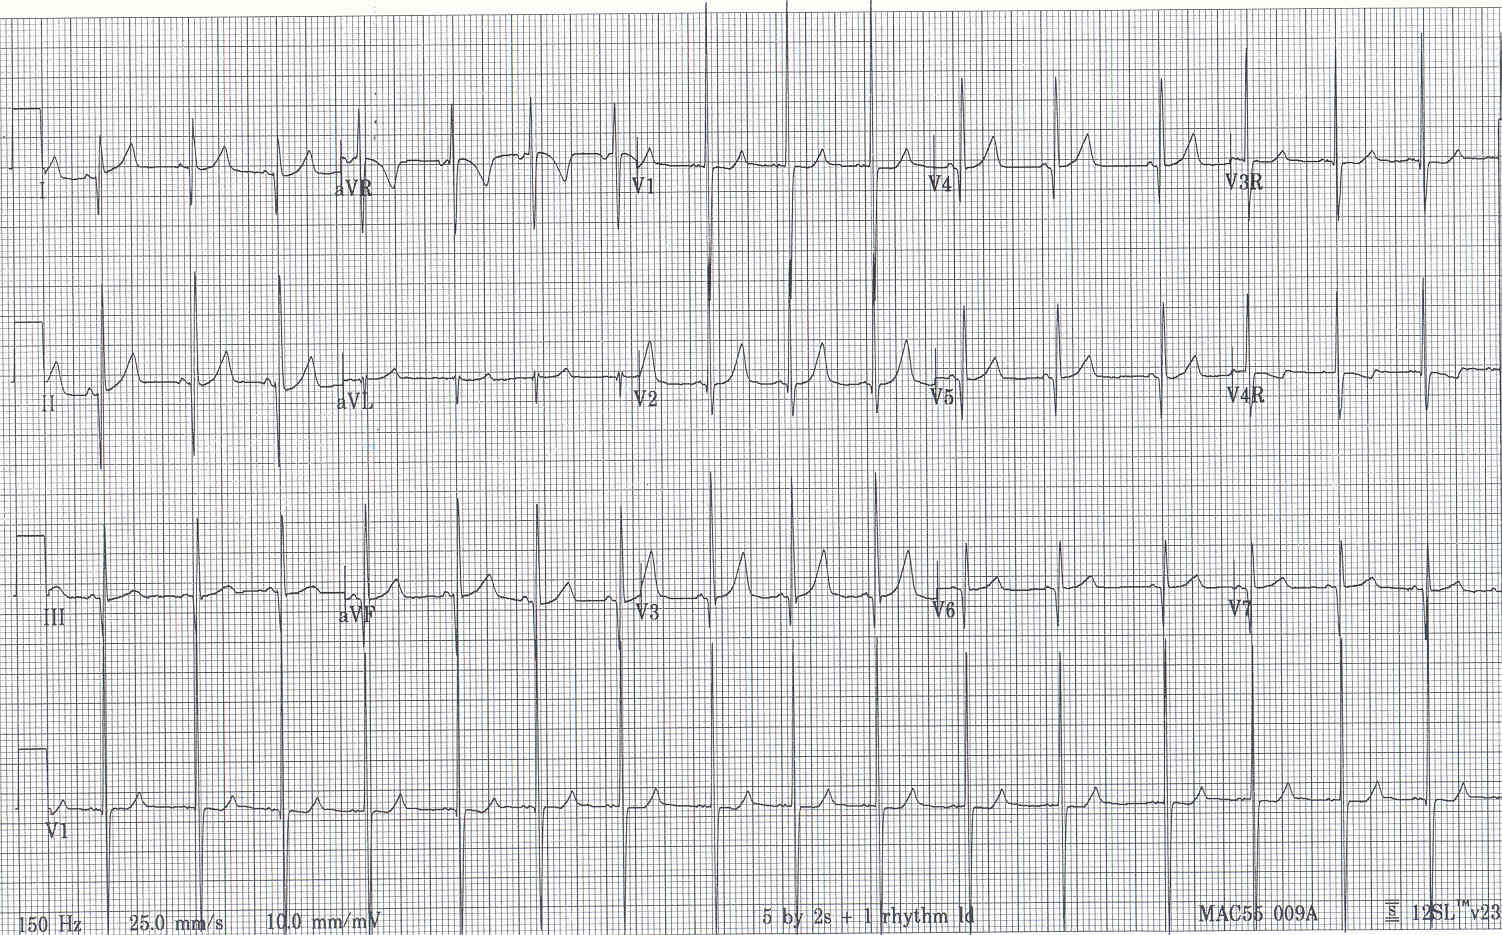 Pedi Cardiology Ekg Dextrocardia Vs Dextroversion